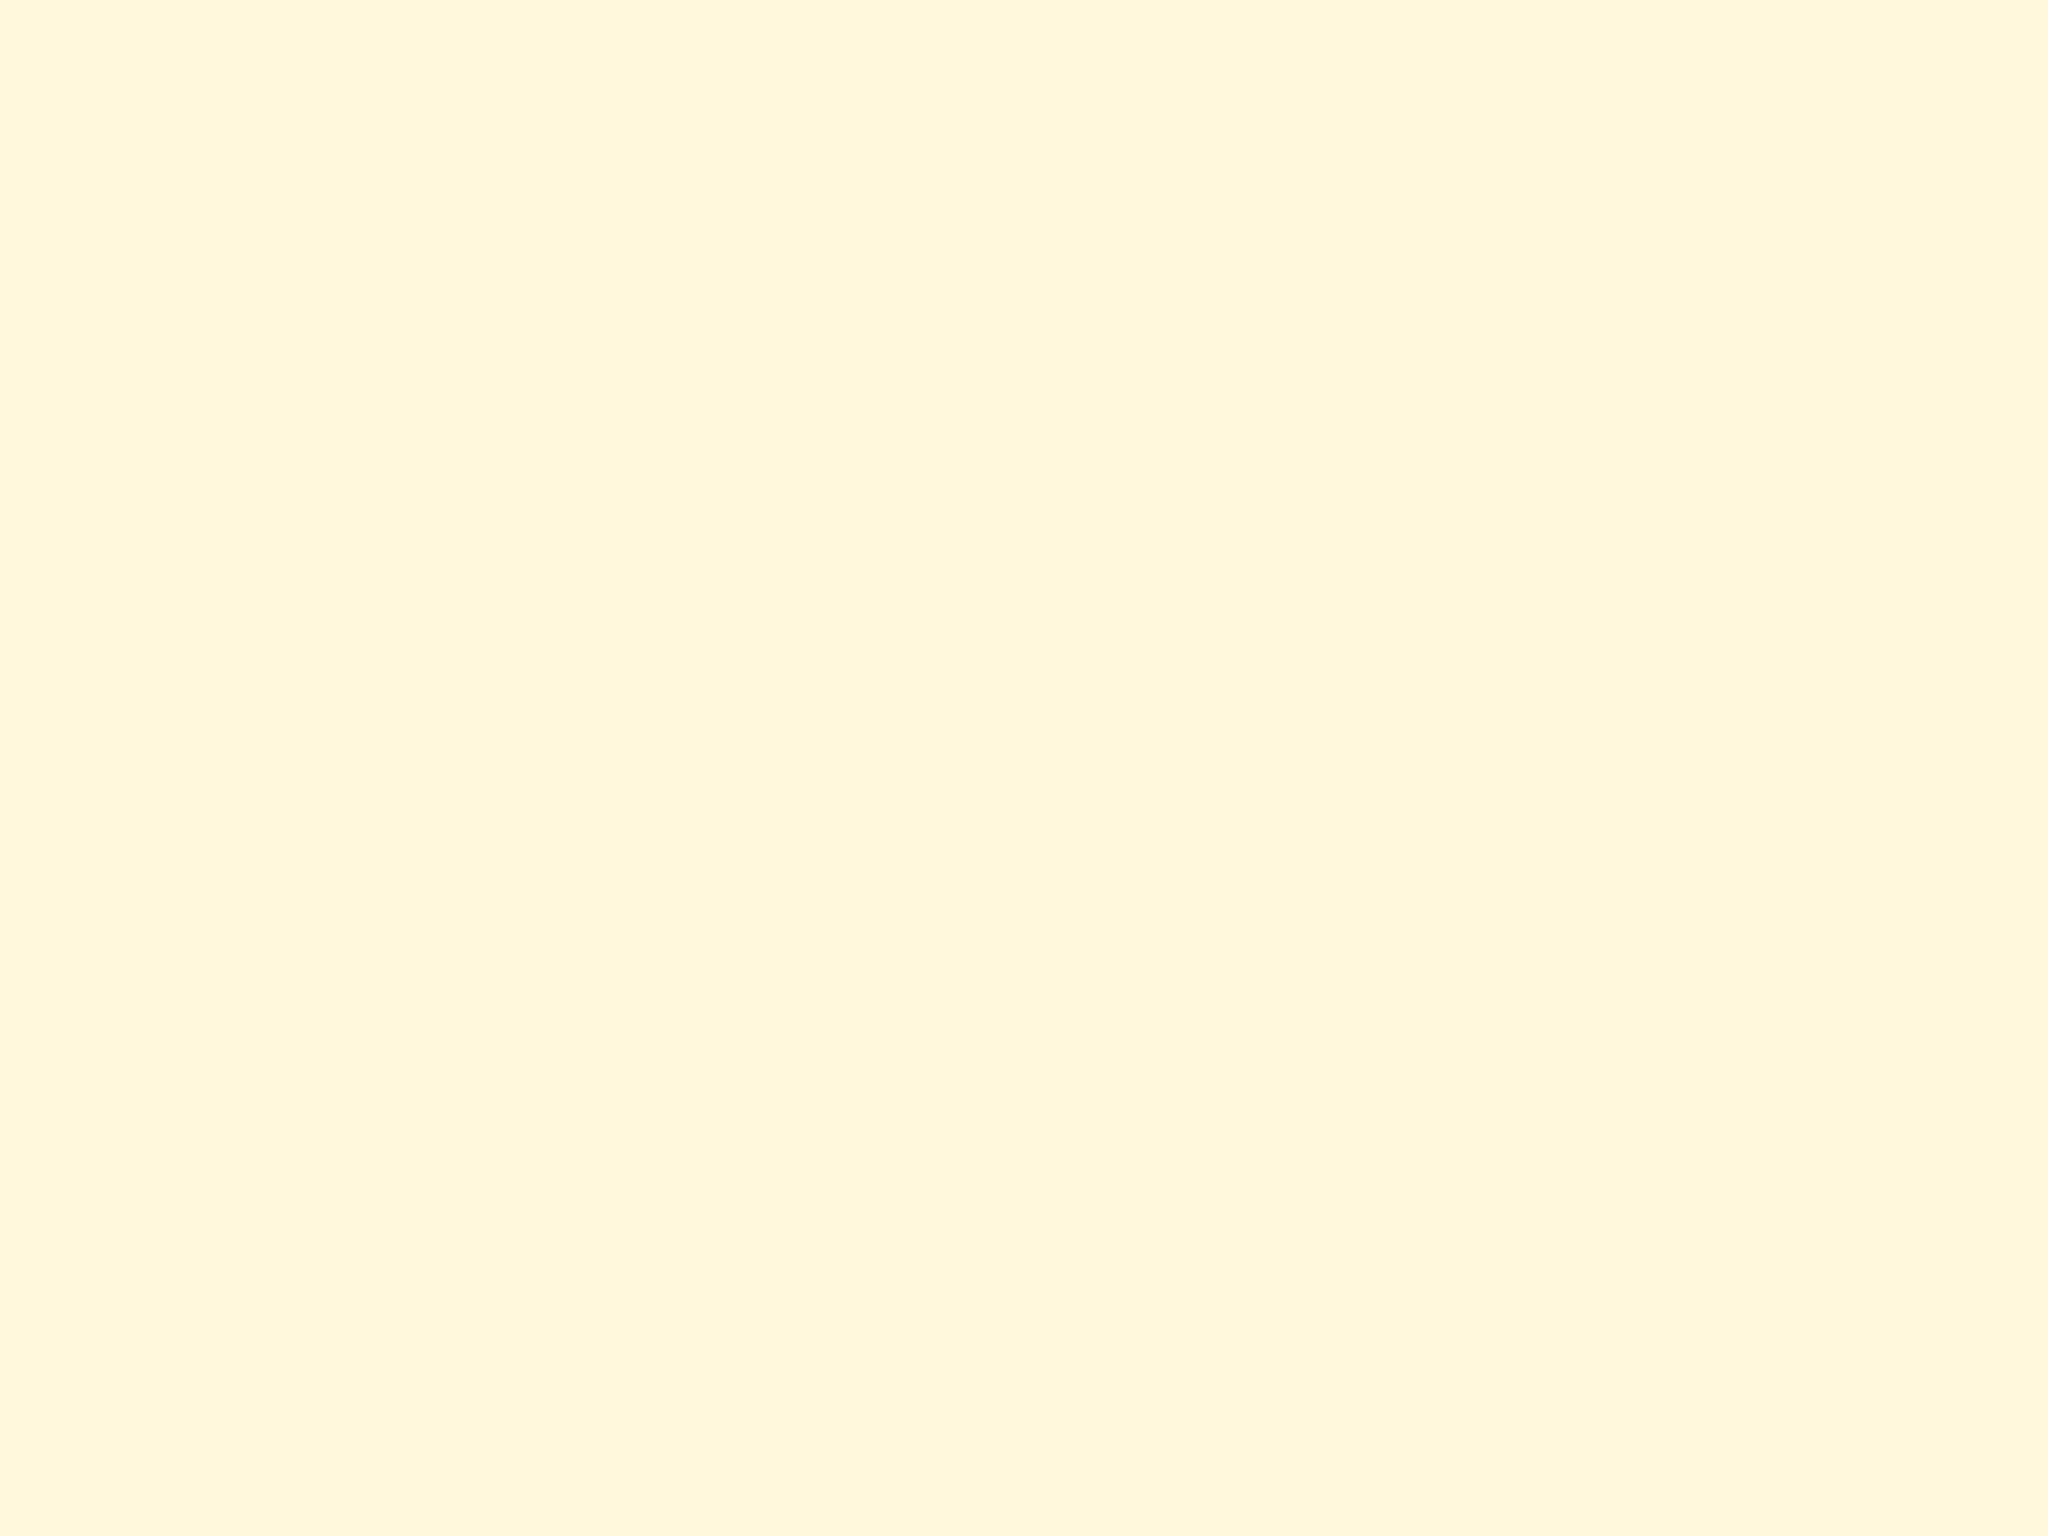 2048x1536 Cornsilk Solid Color Background